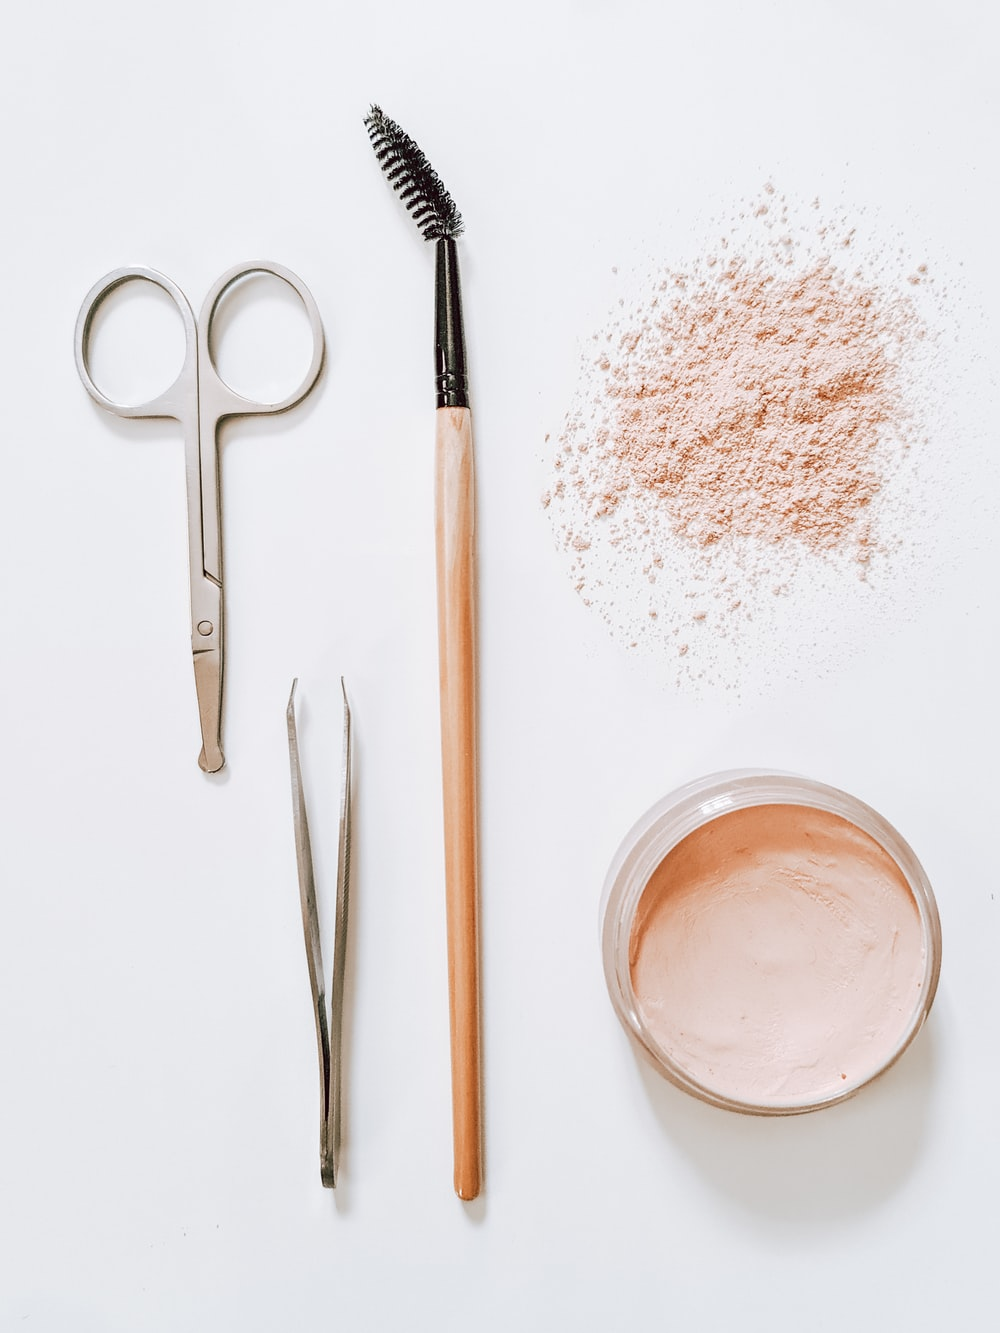 white powder on clear glass jar beside silver scissors